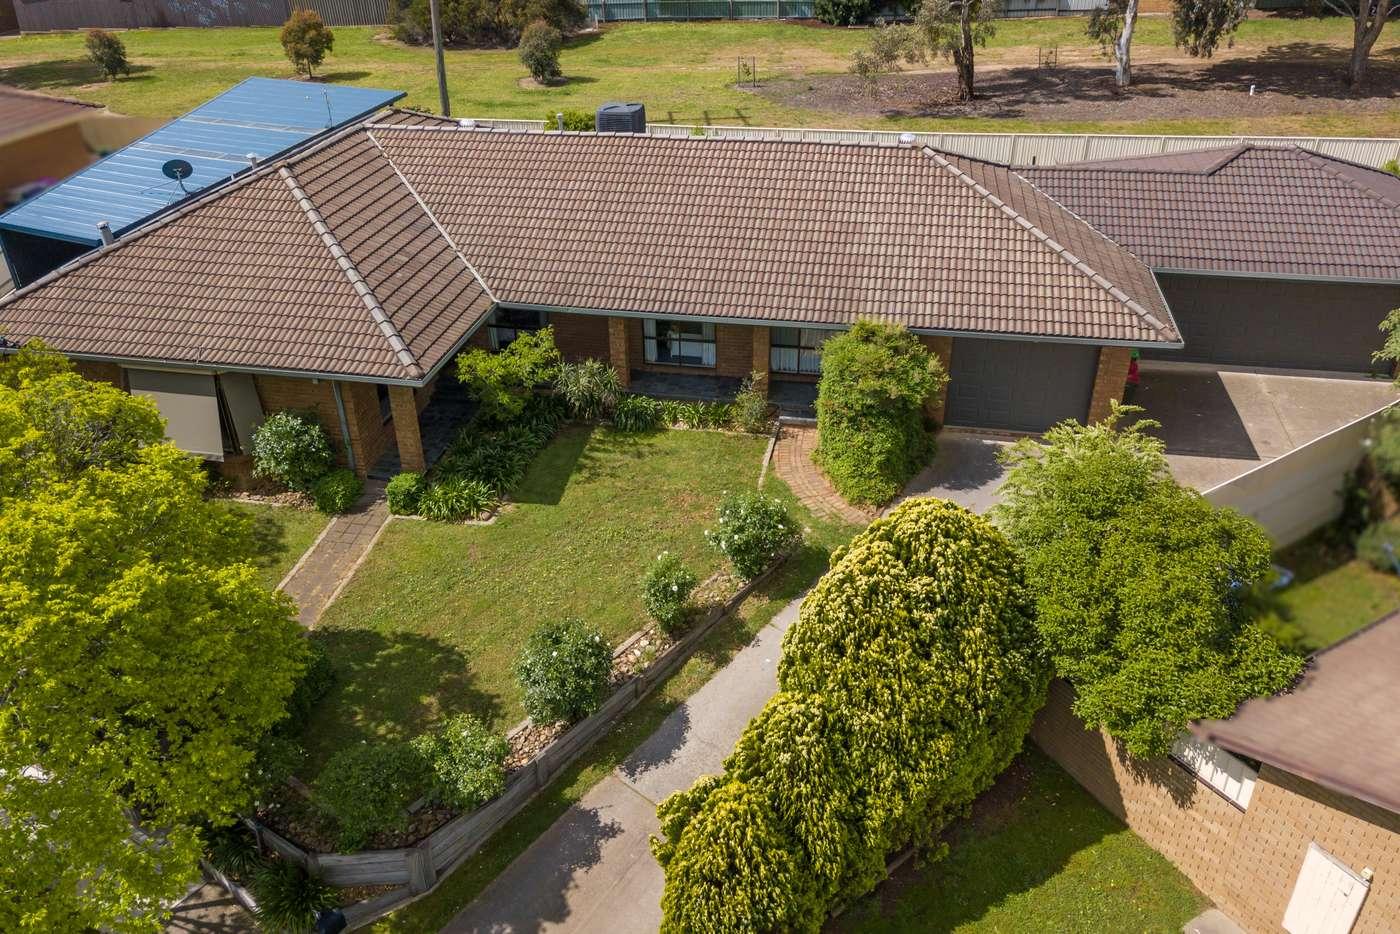 Main view of Homely house listing, 5 Skipton Ct, Wodonga VIC 3690